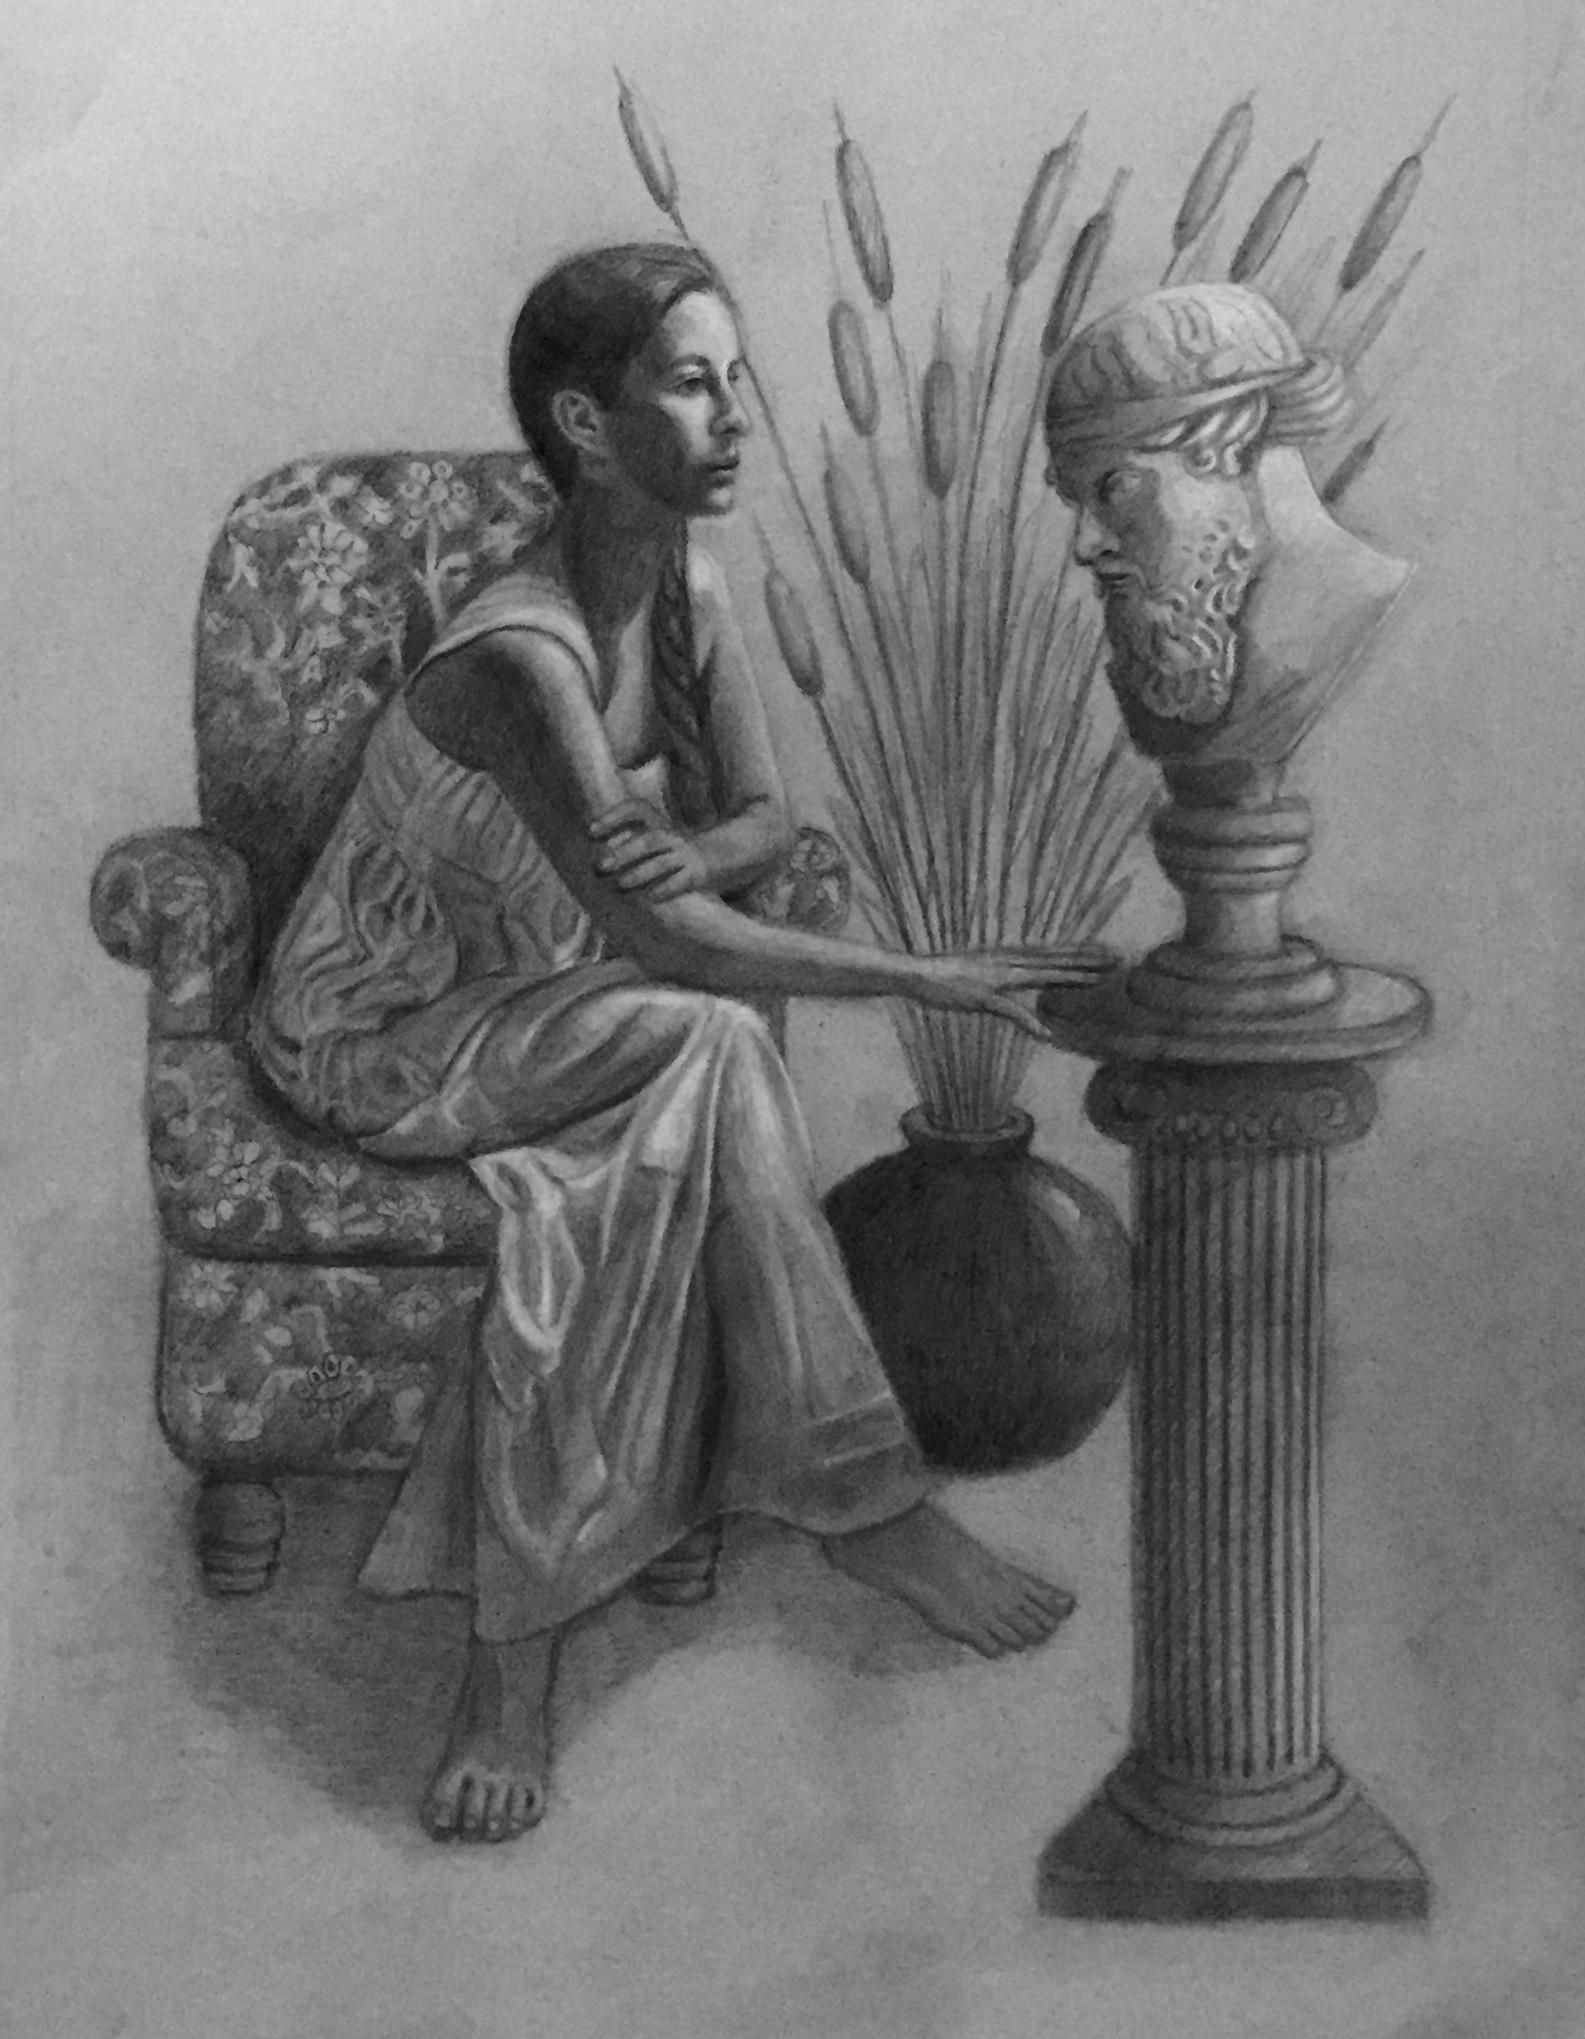 Hypatia Contemplating a bust of Plato